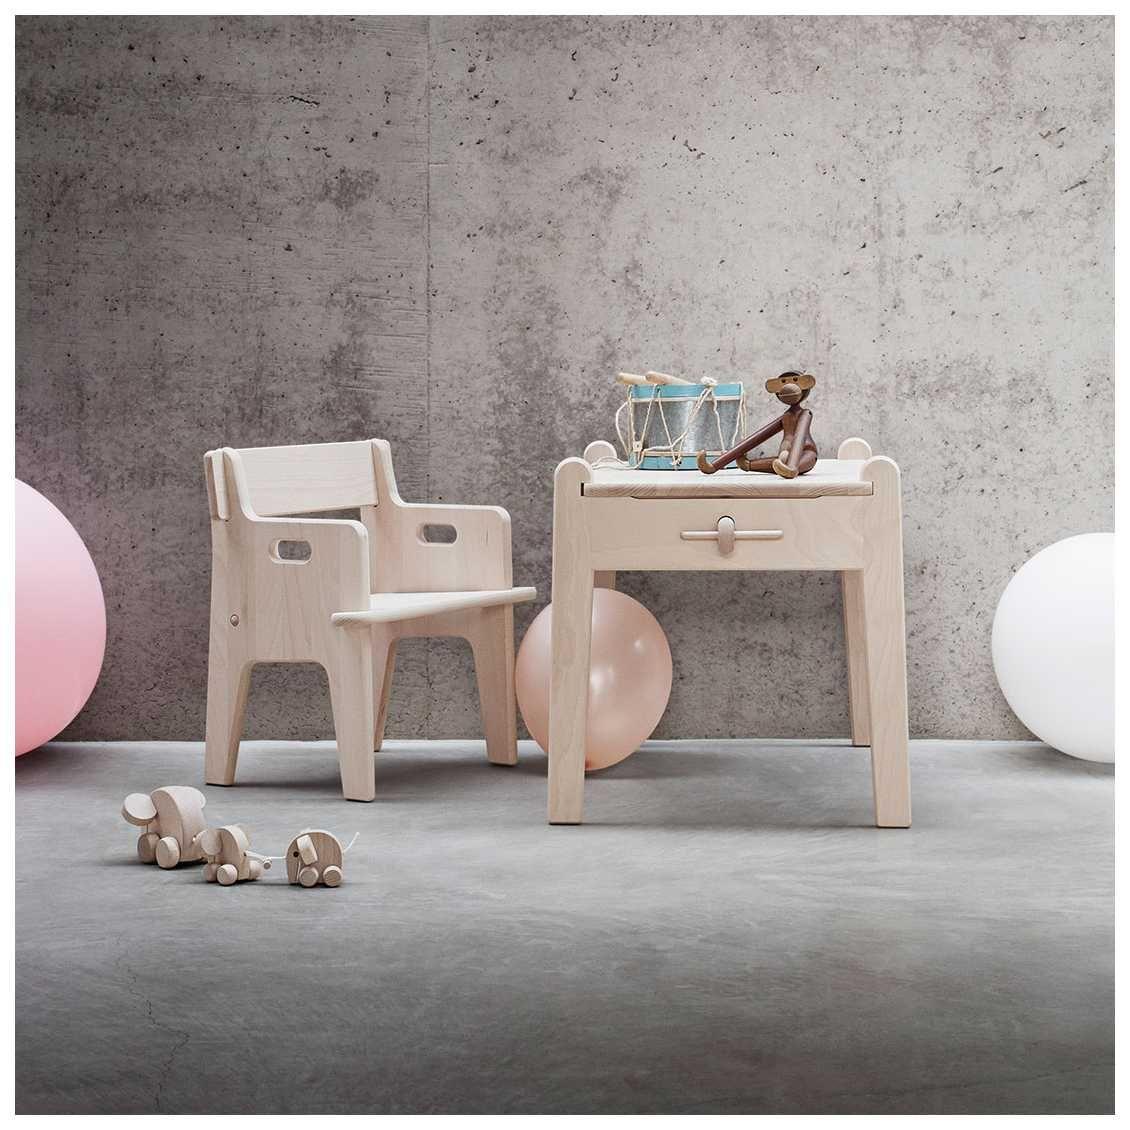 Wegner for kids play table by carl hansen søn scandinavian childrens furniture nordic furniture